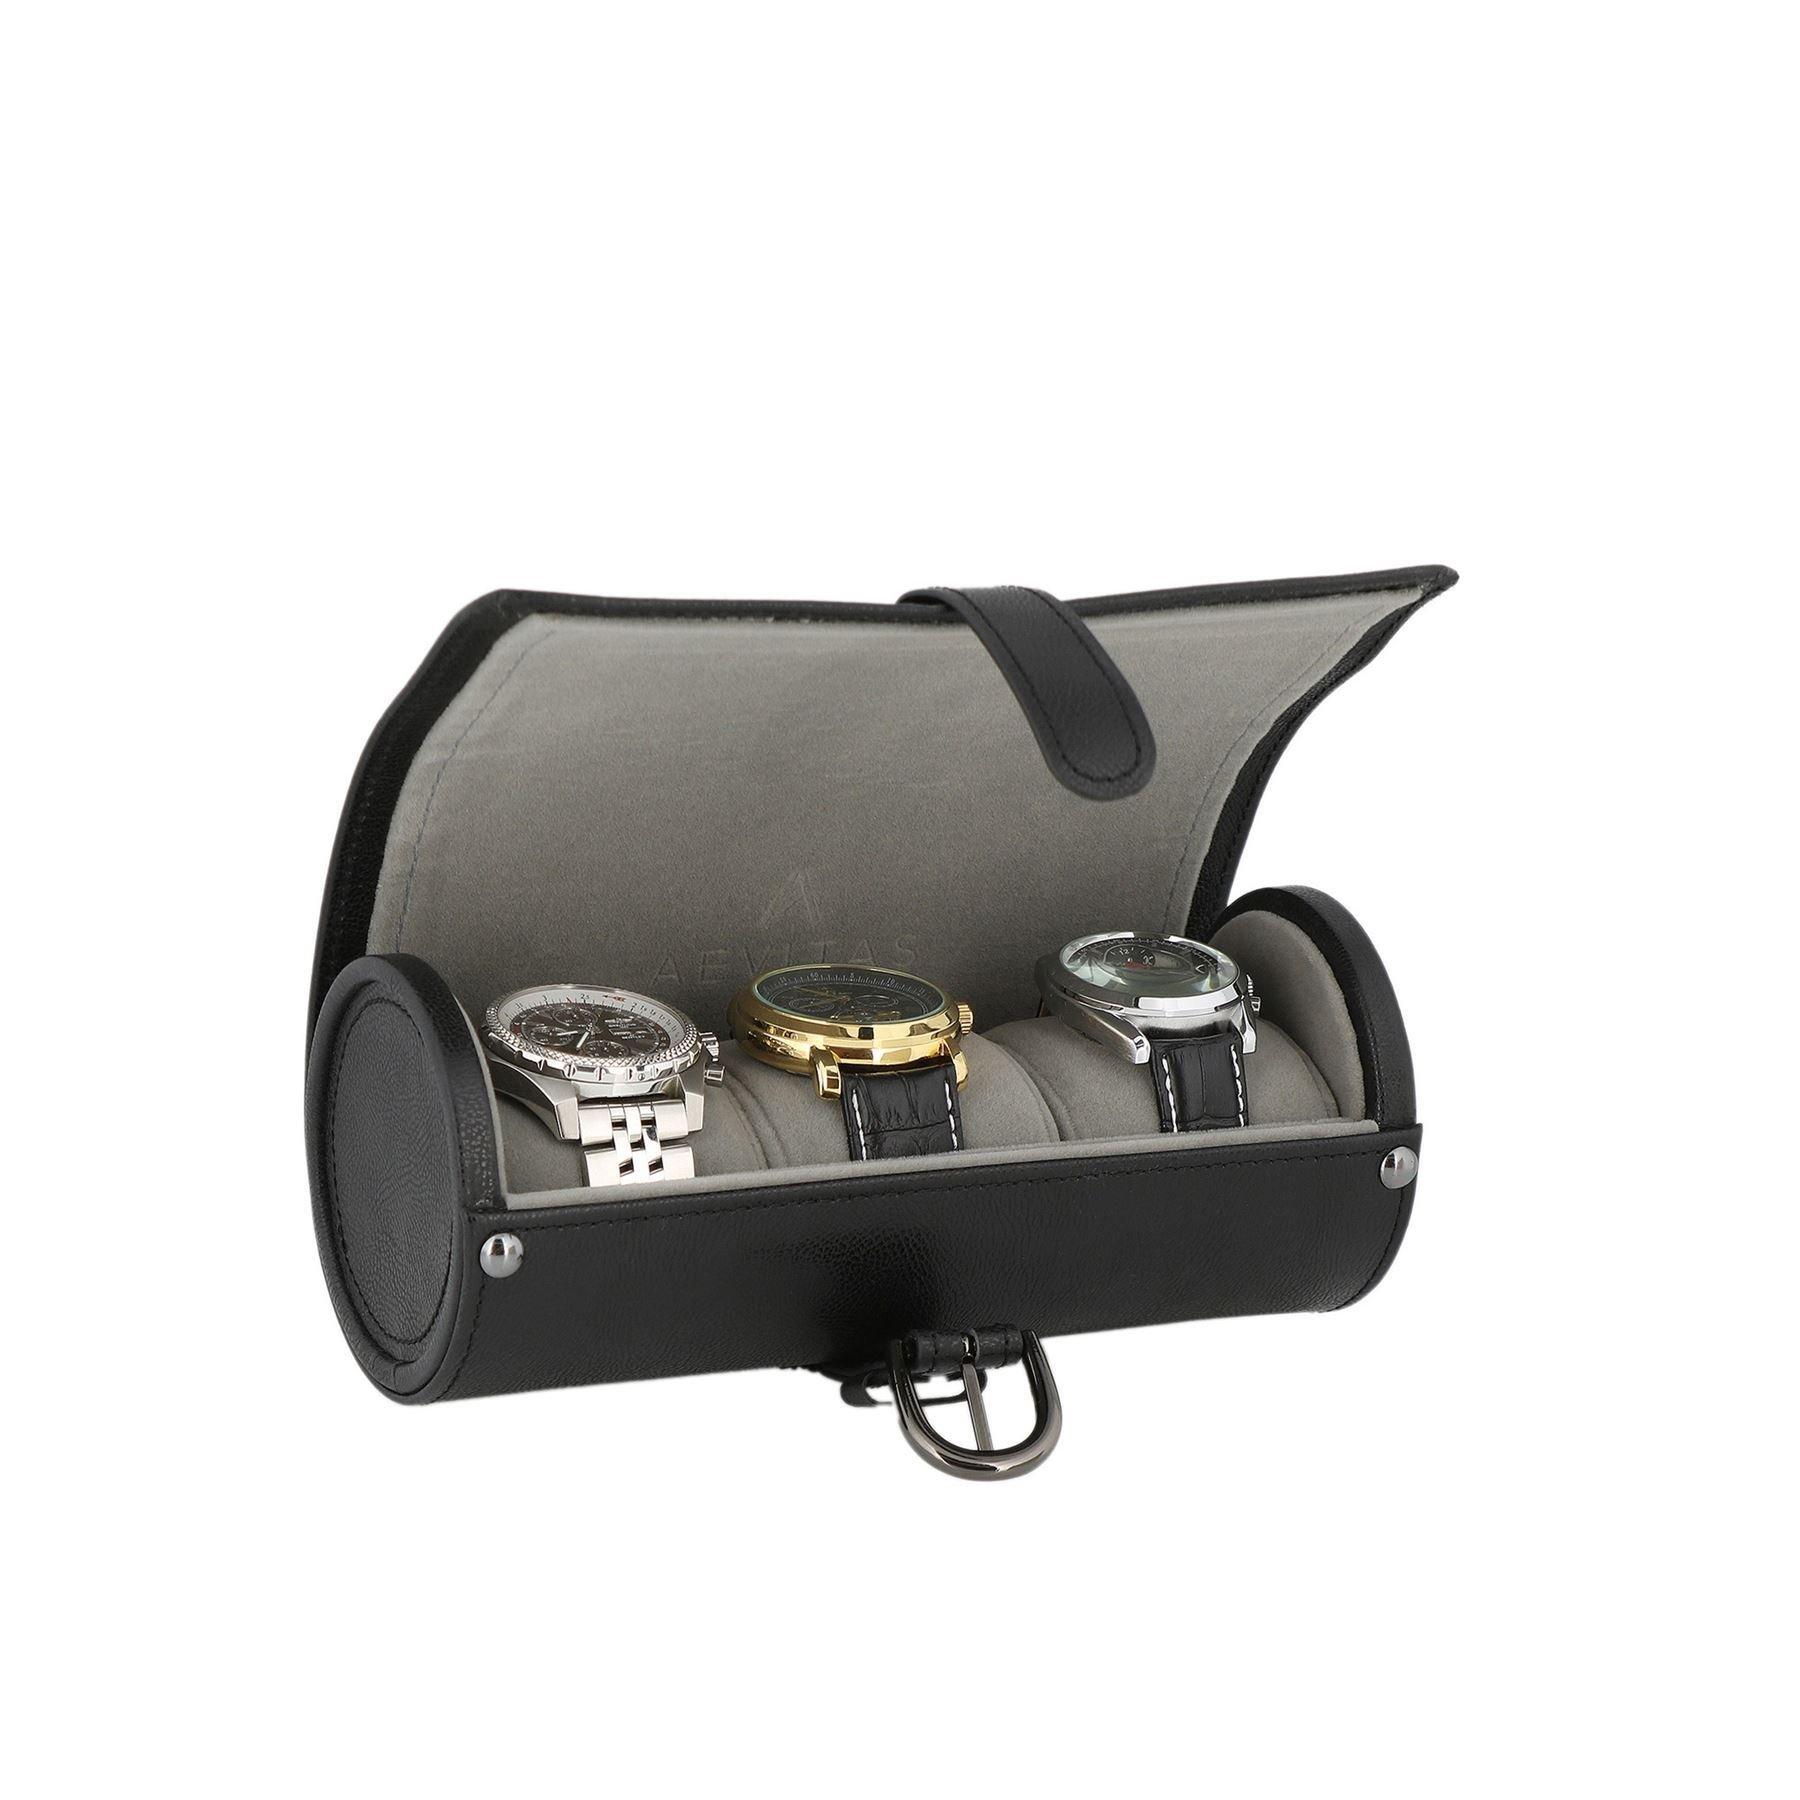 Genuine Black Leather Watch Travel Roll 3 Watches Platinum Velvet Lining by Aevitas